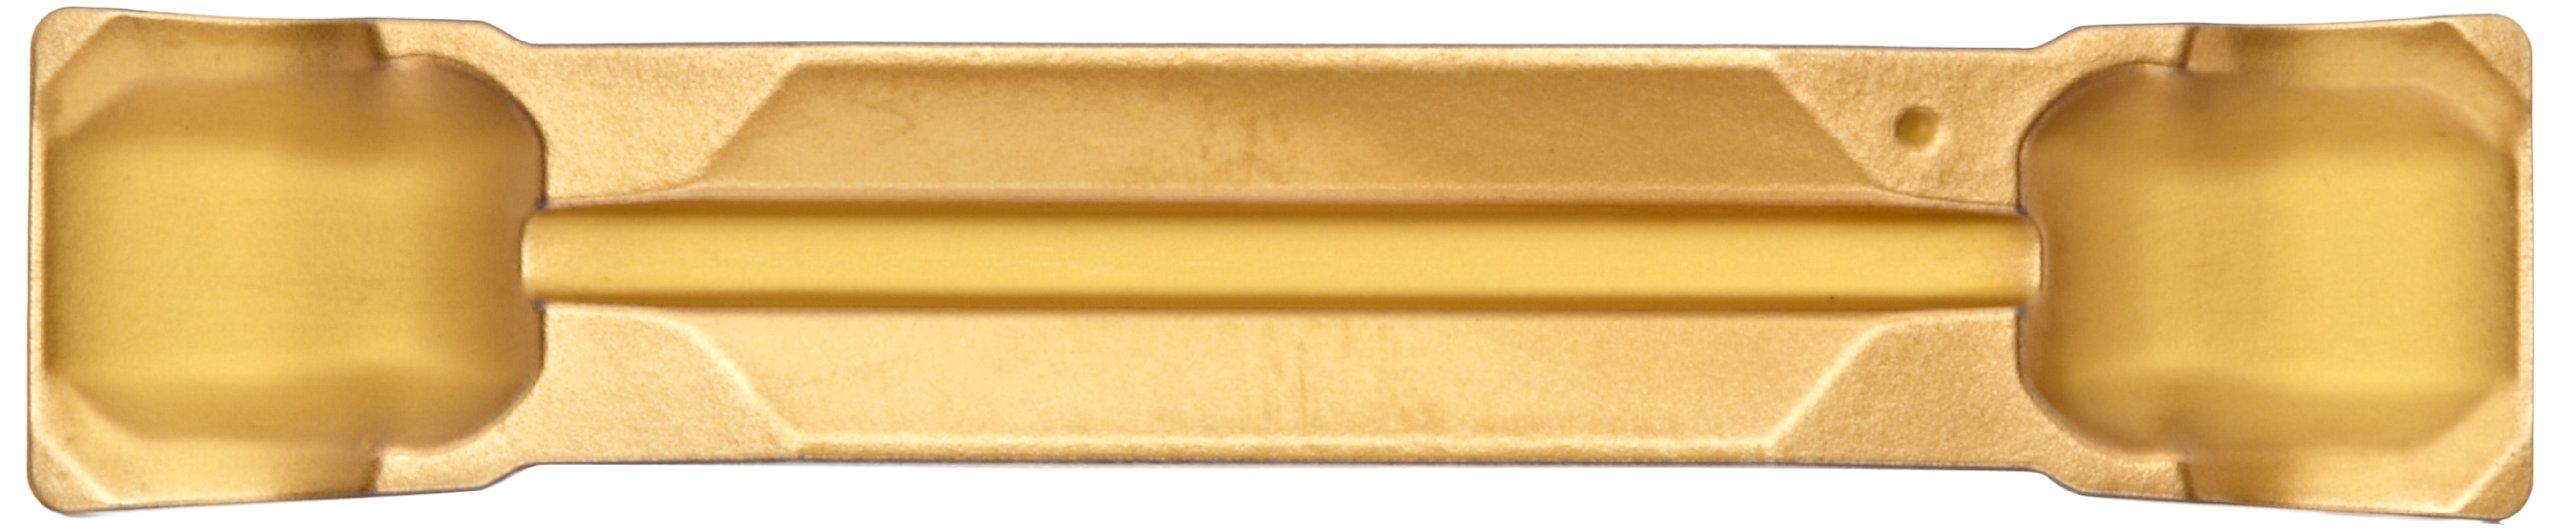 Sandvik Coromant CoroCut 2-Edge Carbide Parting Insert, GC2135 Grade, Multi-Layer Coating, CR Chipbreaker, 2 Cutting Edges, N123H2-0400-0003-CR, 0.0118'' Corner Radius, H Insert Seat Size (Pack of 10) by Sandvik Coromant (Image #3)